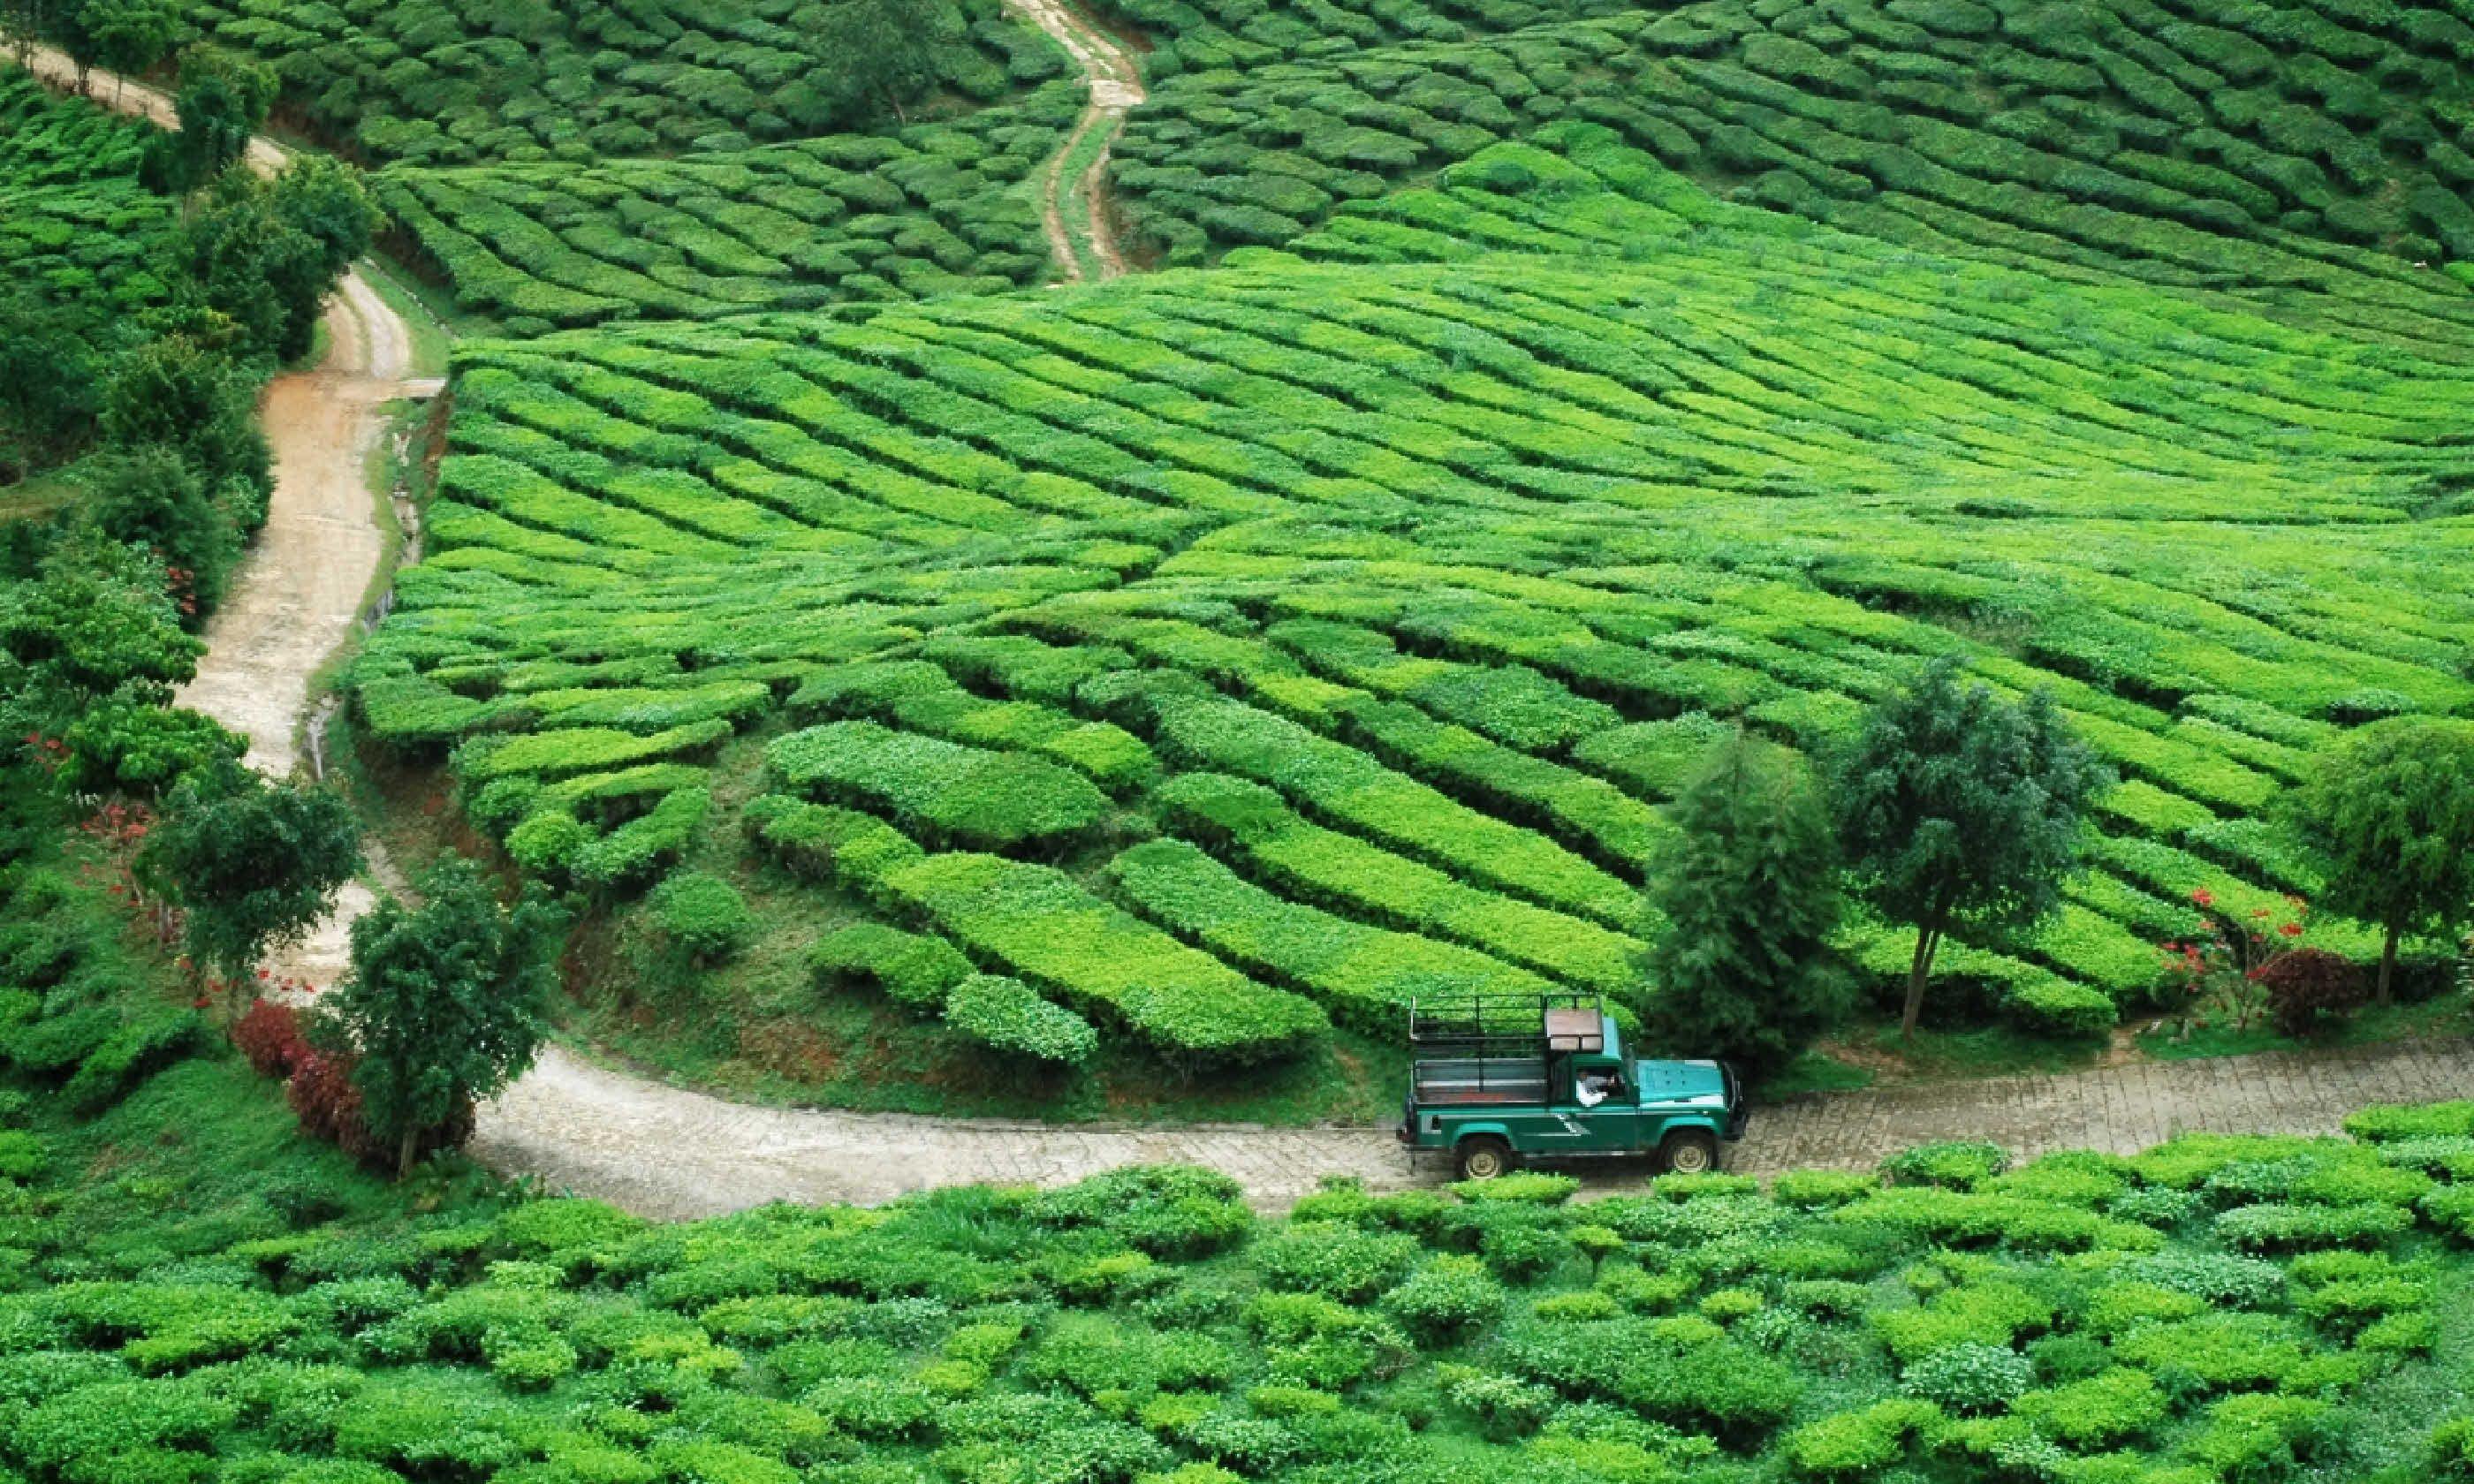 Jeep drive to plantation, Malaysia (Shutterstock)